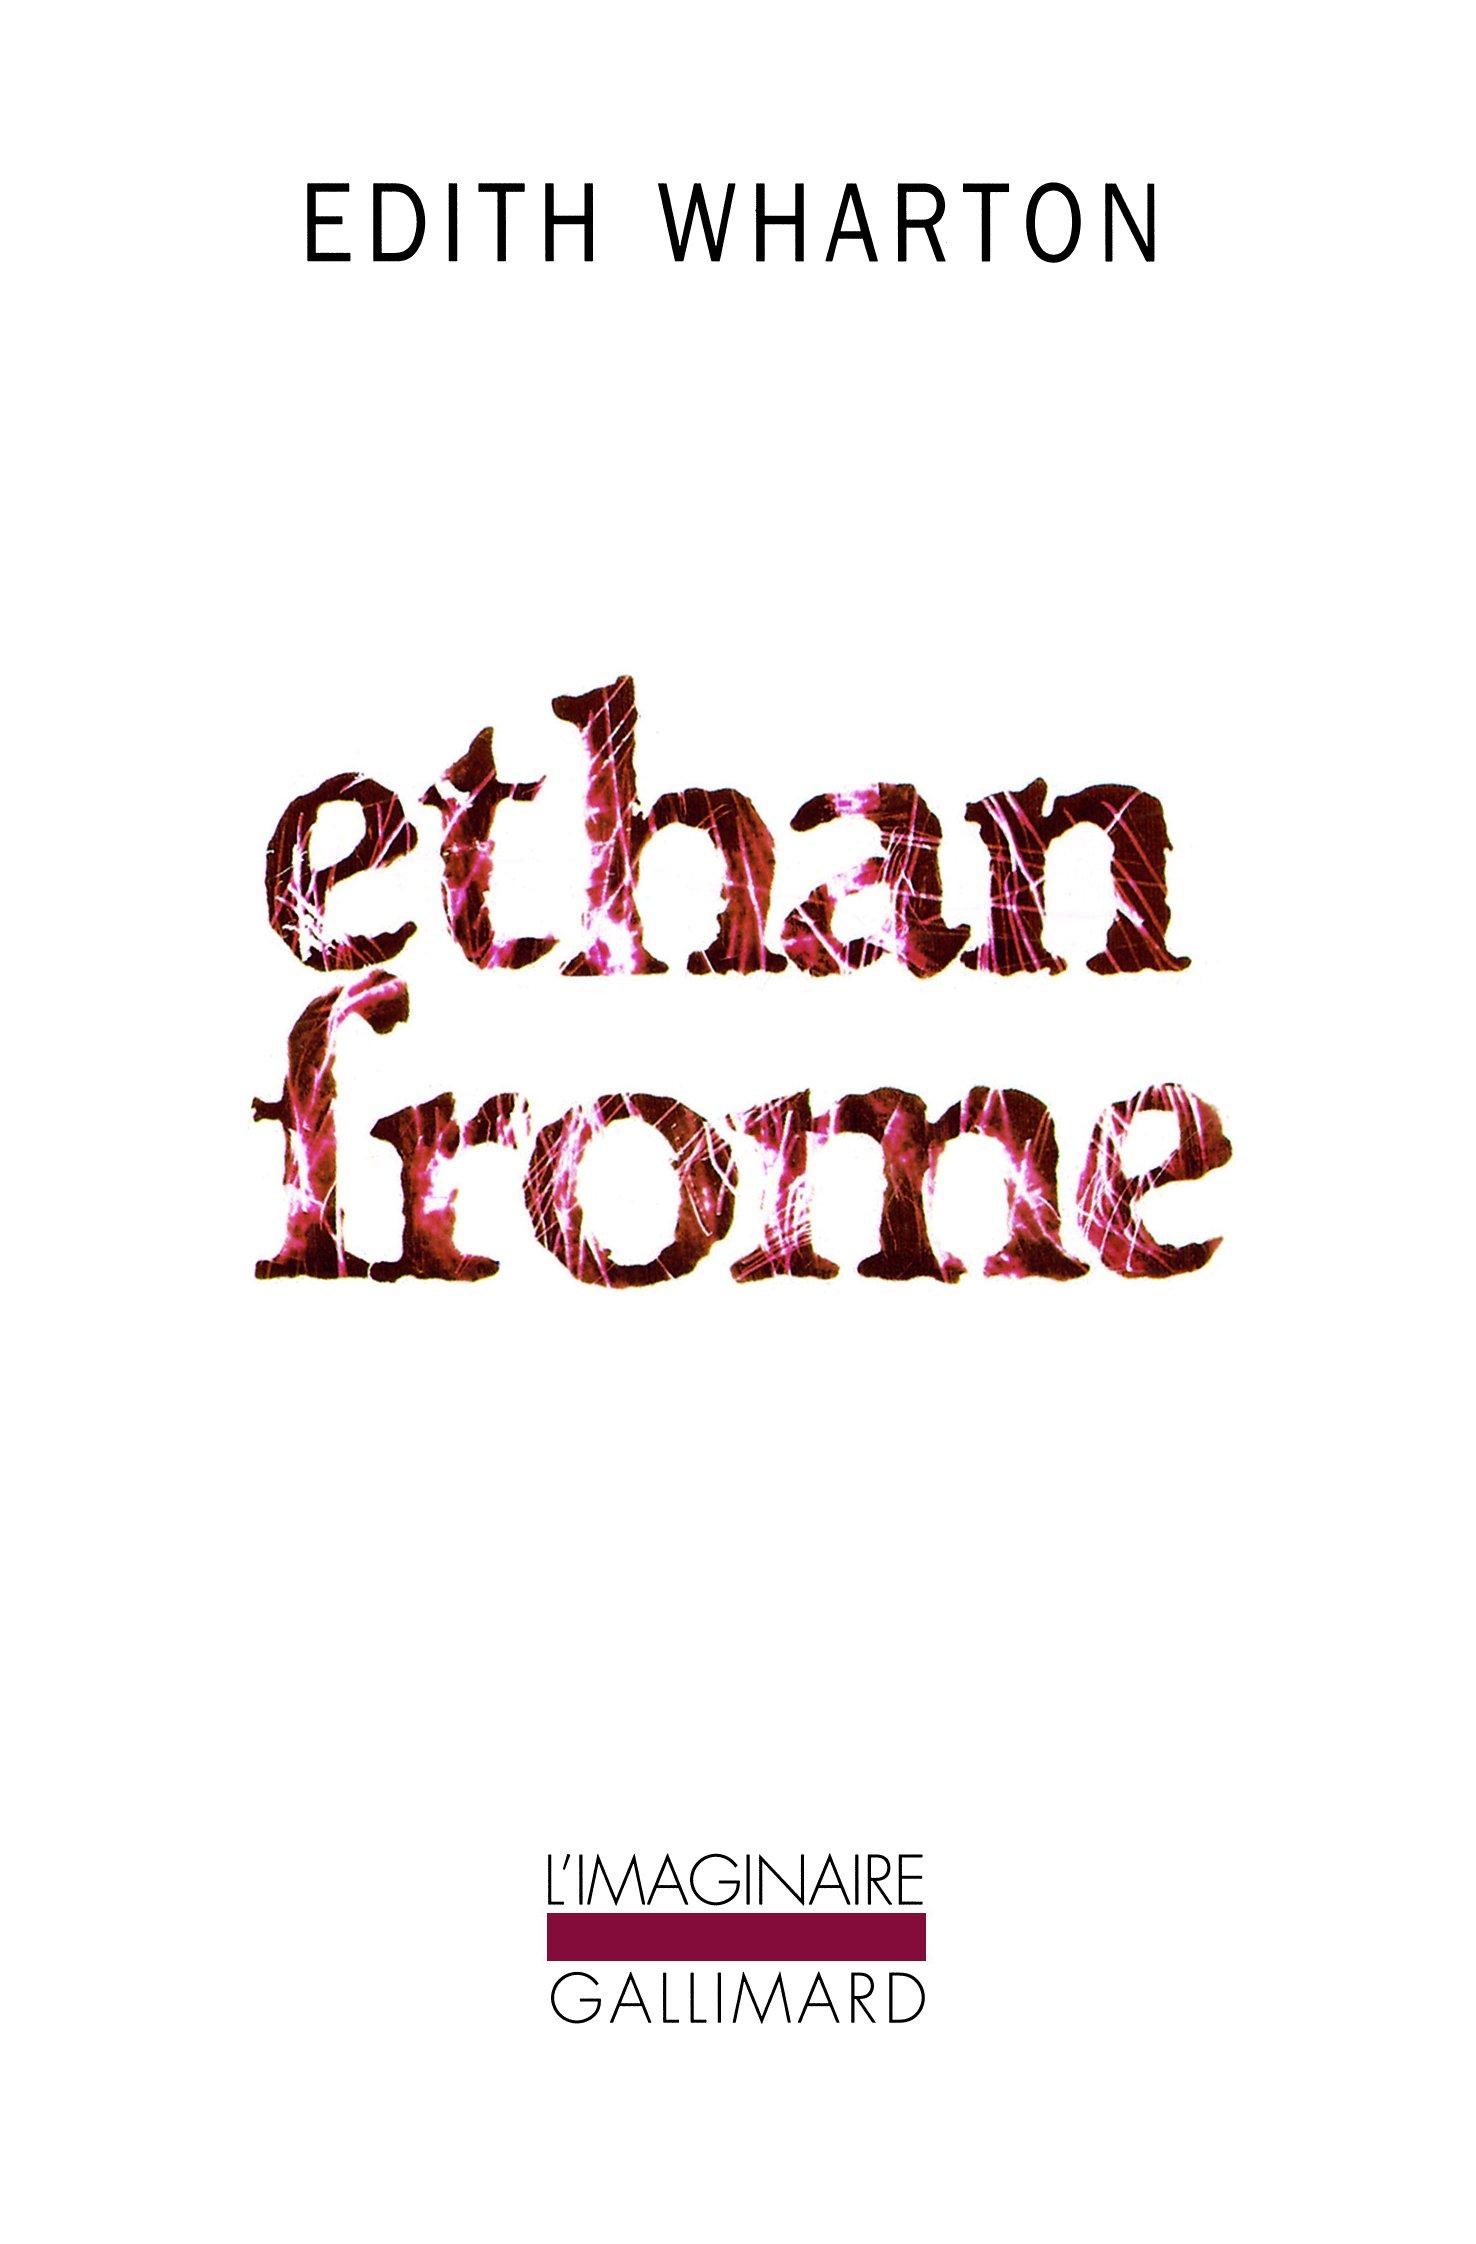 fr ethan frome edith wharton pierre leyris pierre  fr ethan frome edith wharton pierre leyris pierre leyris livres